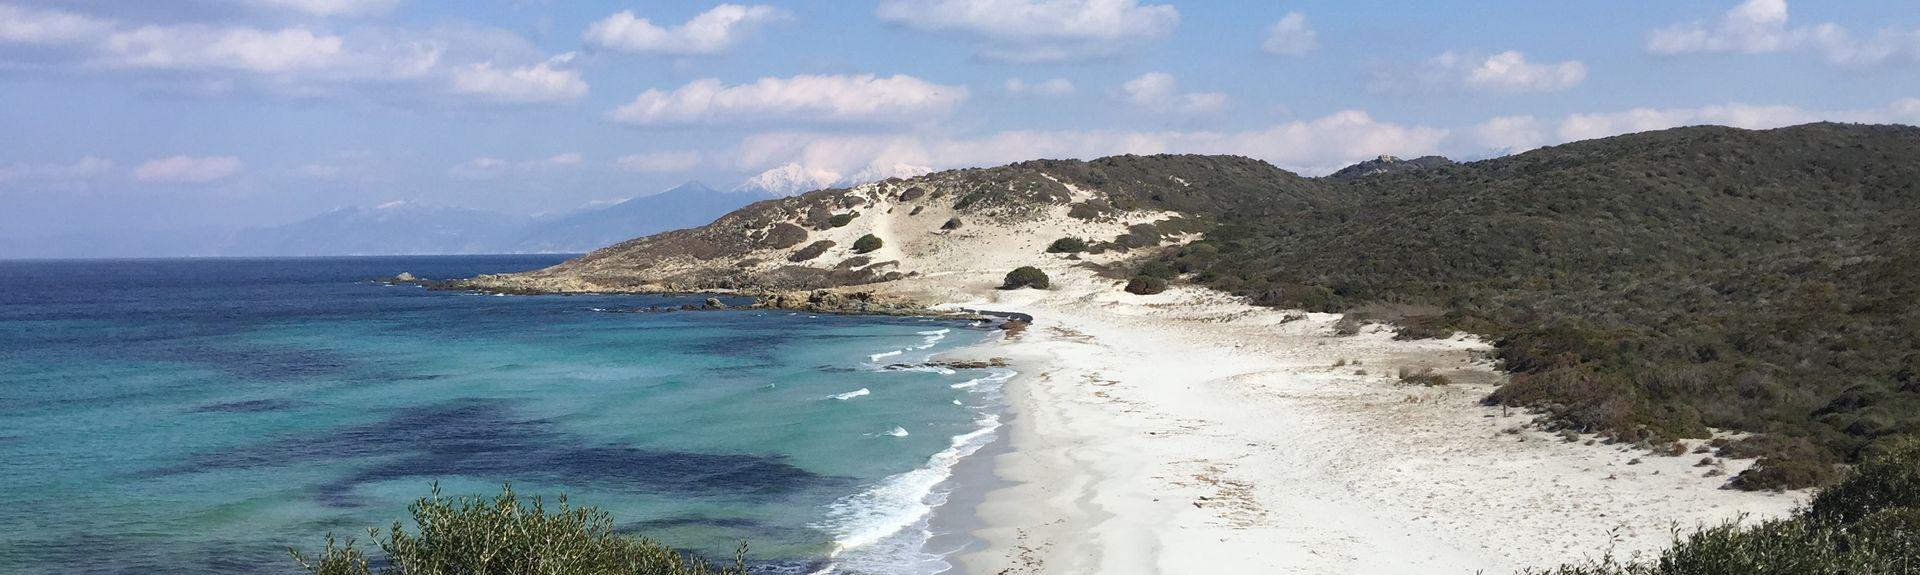 Scandola Nature Reserve, Osani, Corse-du-Sud, France